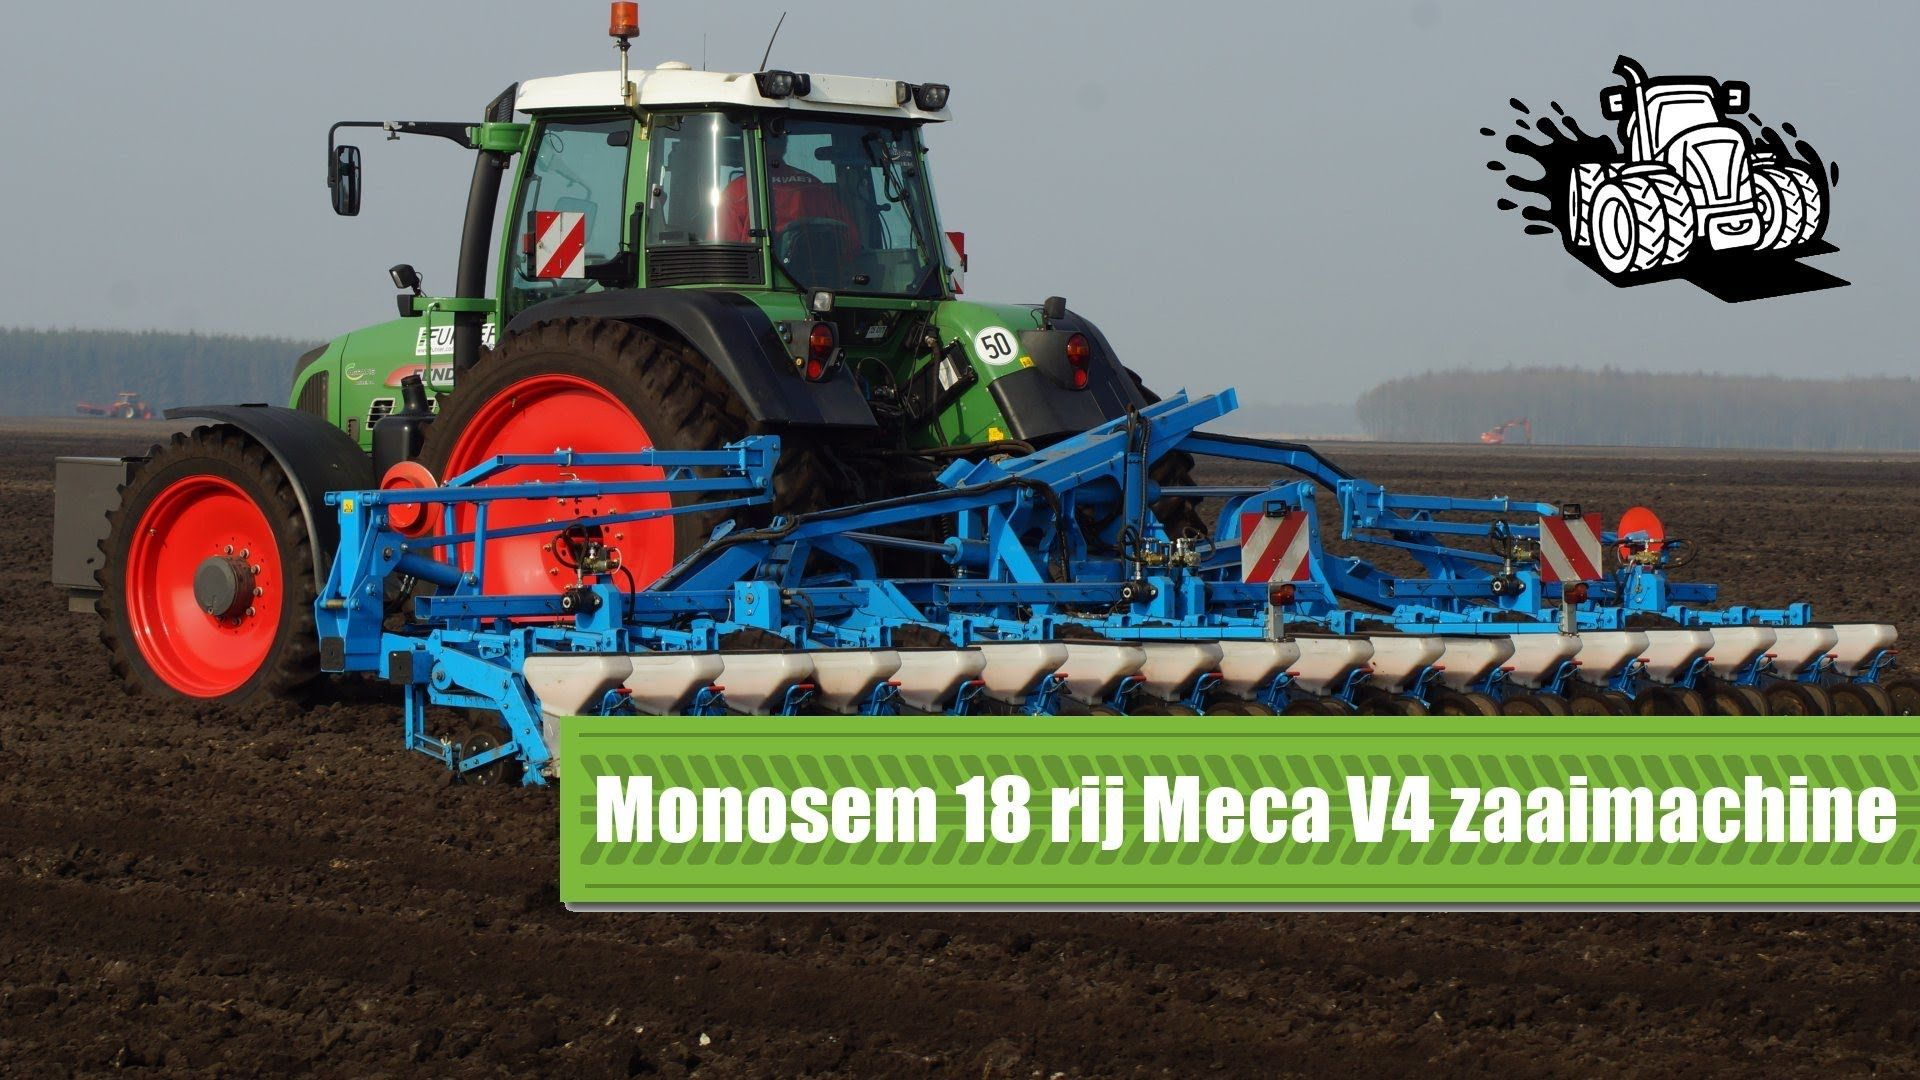 Monosem 18 rij Meca V4 bietenzaaimachine Loonbedrijf Fuhler Emmen Trekke...